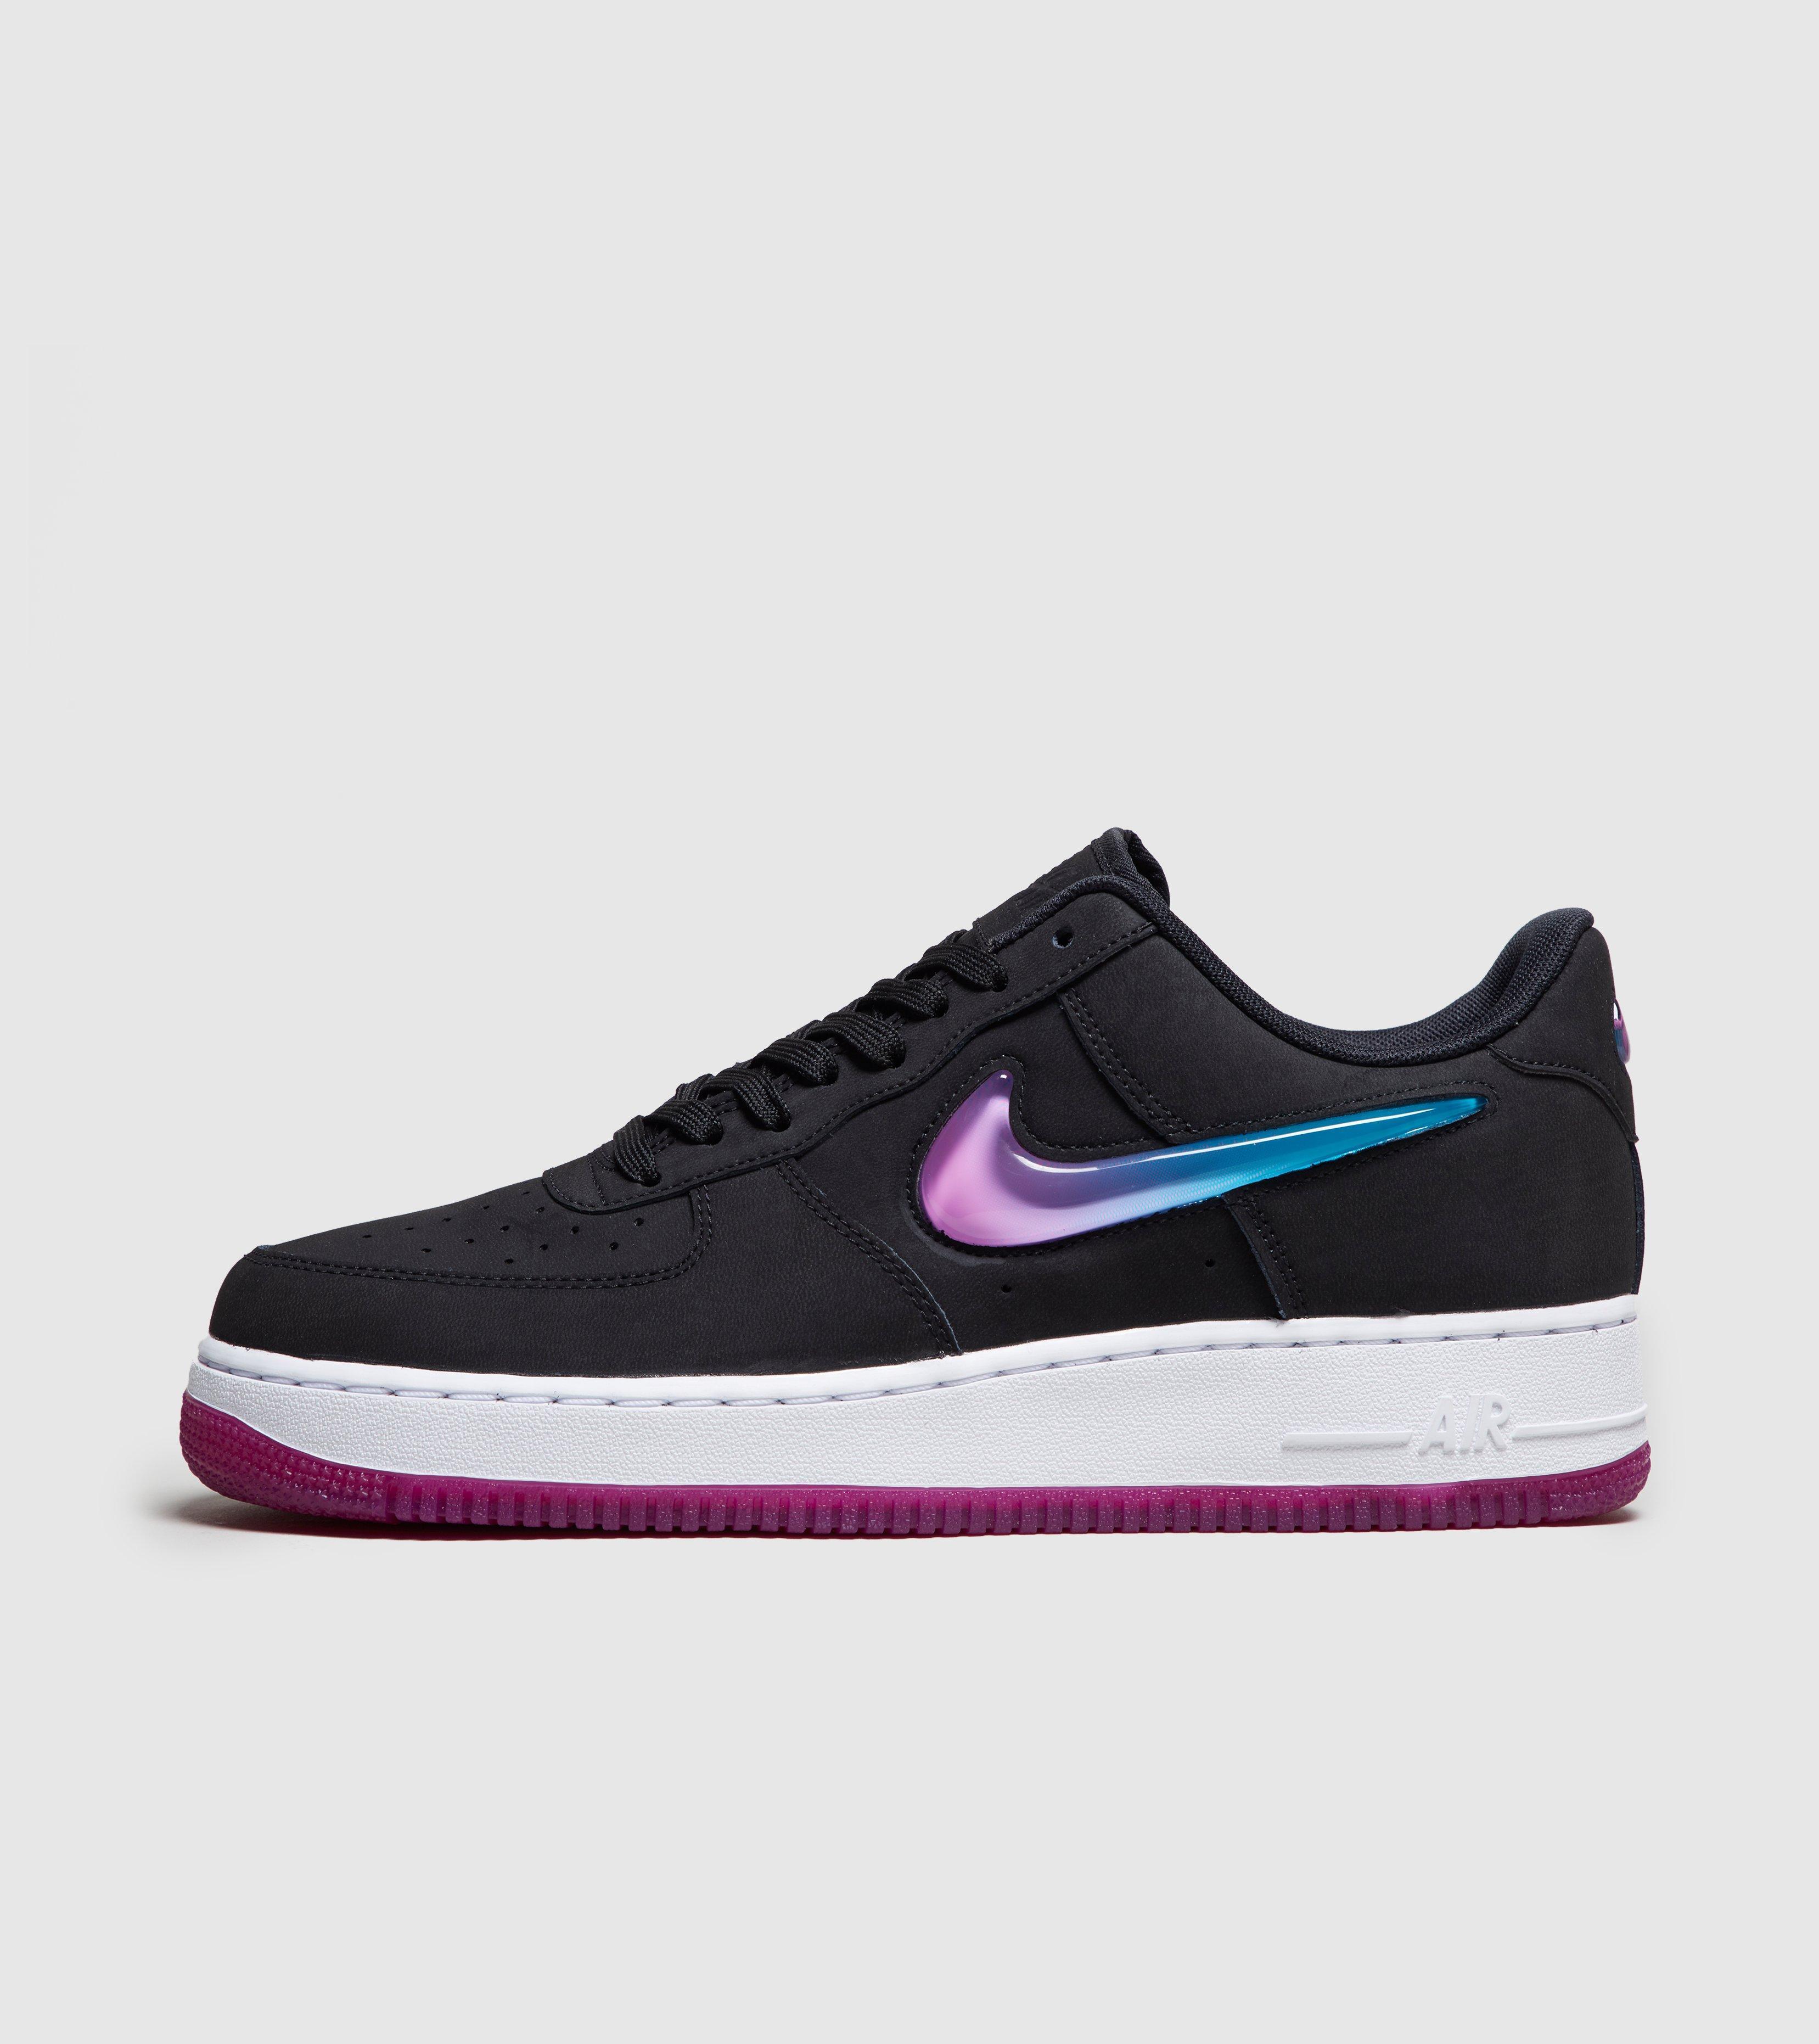 Nike Air Force 1 Low Jelly Jewel ,,Obsidian Mist